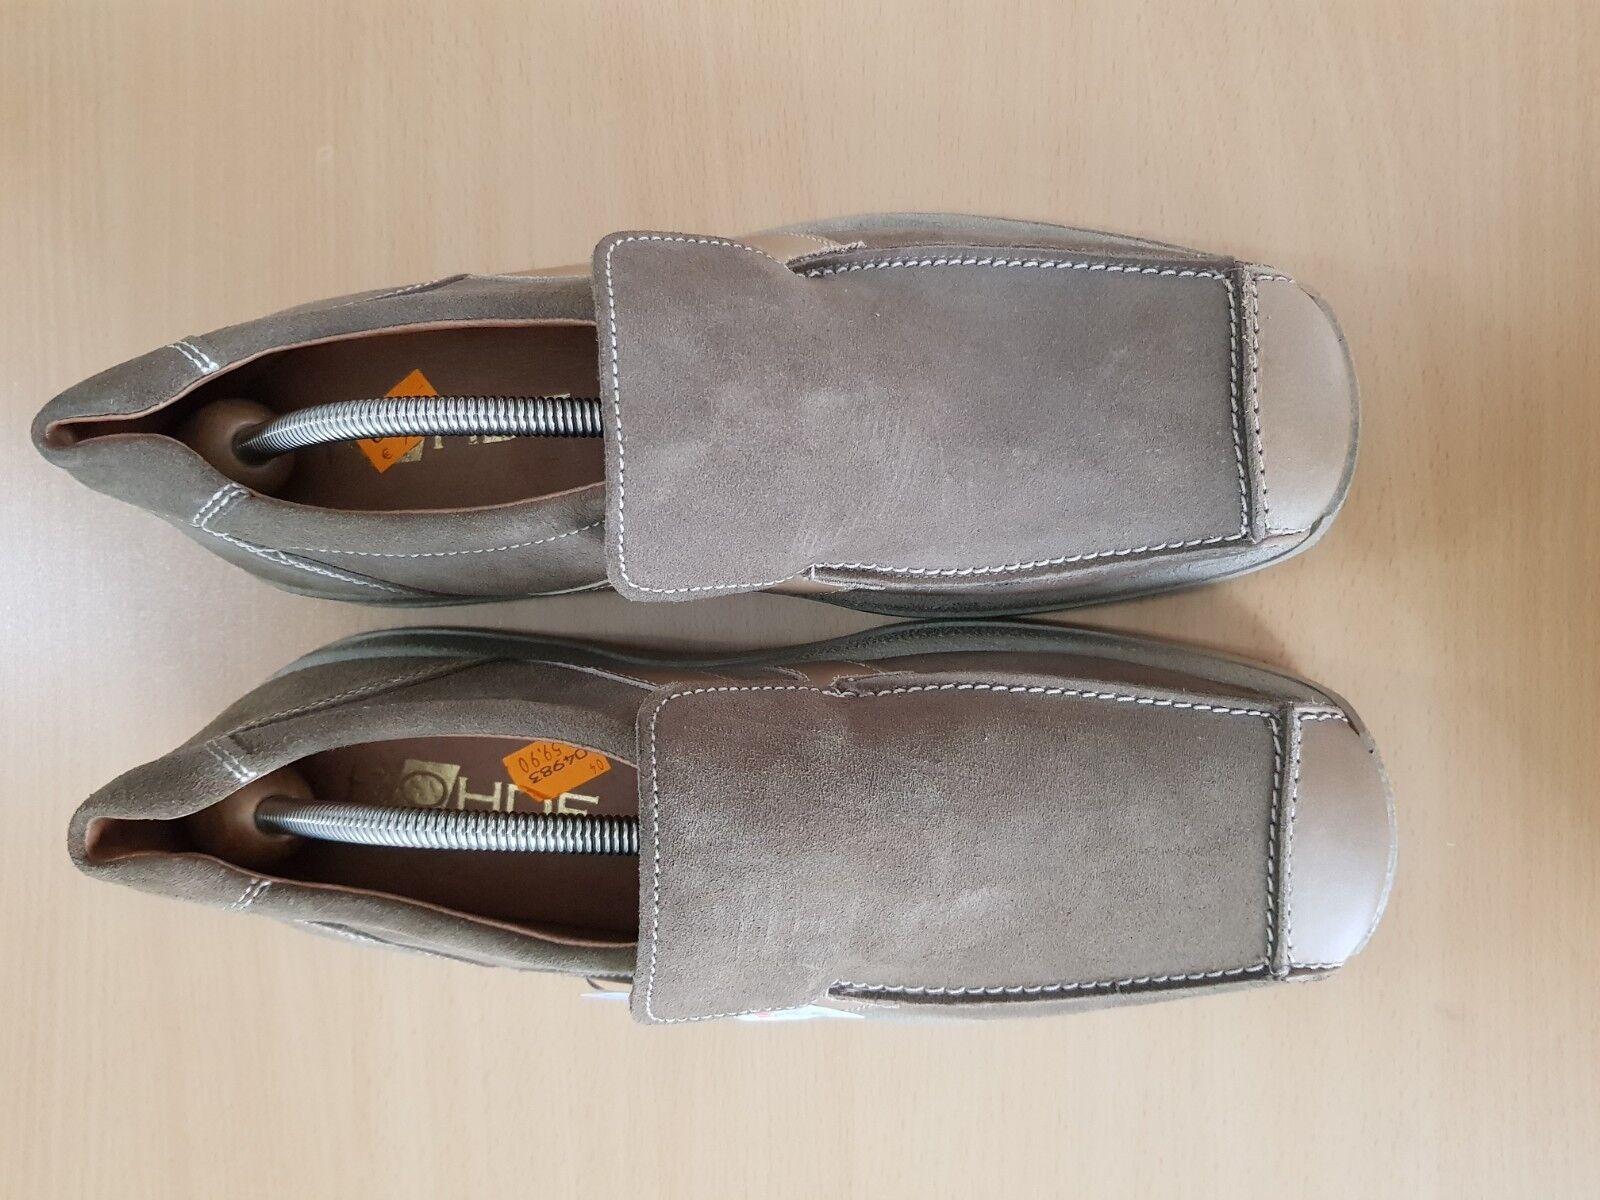 Rohde Herren Schuhe  Slipper WildLeder grau 11 braun Gr. 11 grau / 46 TOP d50f46